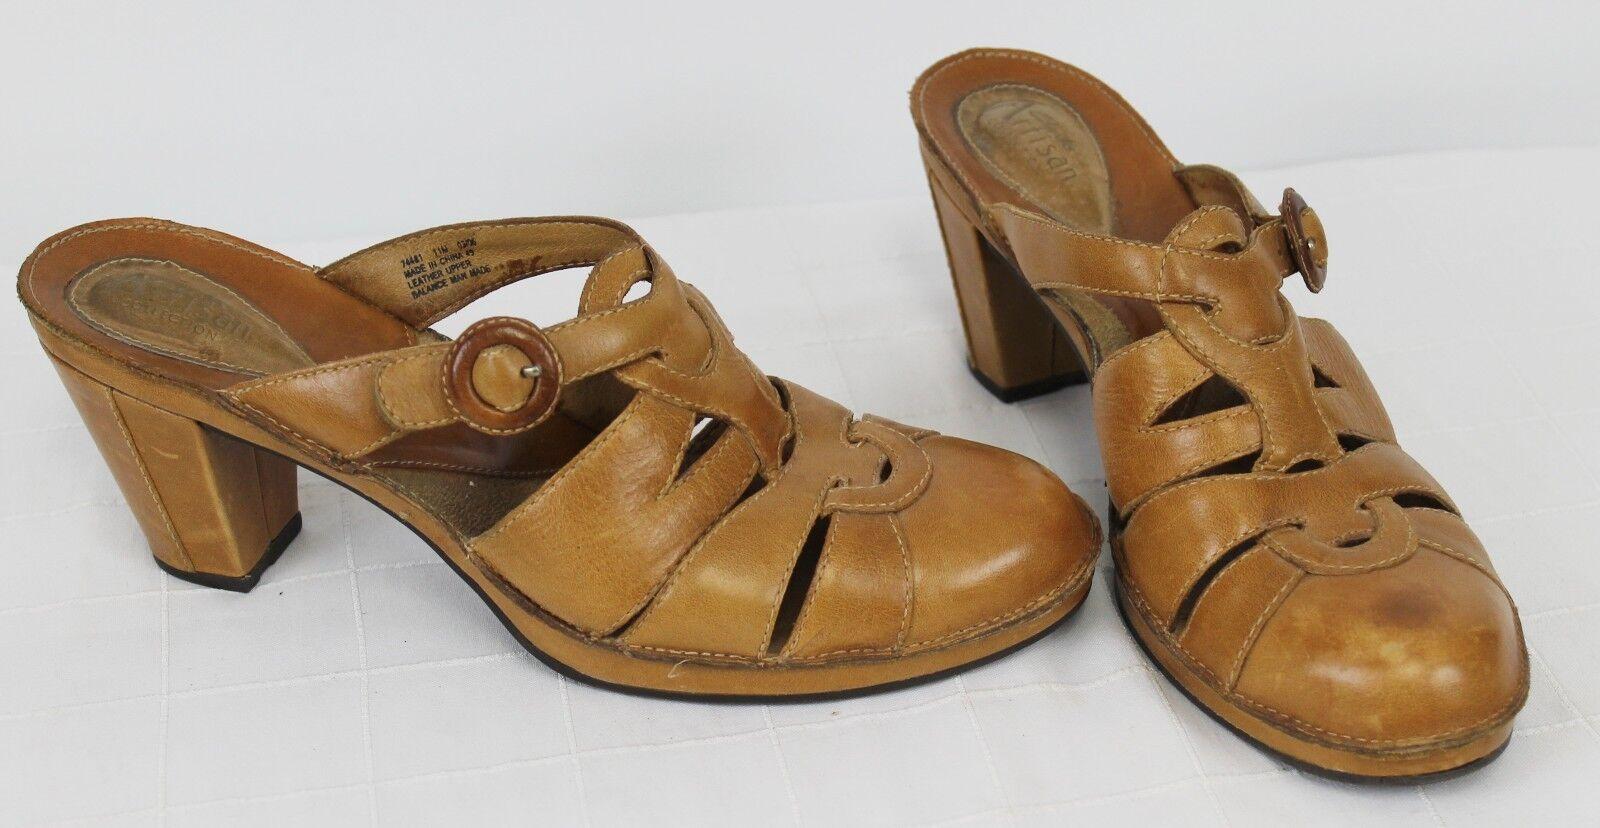 Clarks Artisan Heels Sandals Slip on 11M 74481 Casual Work Comfort Cushion